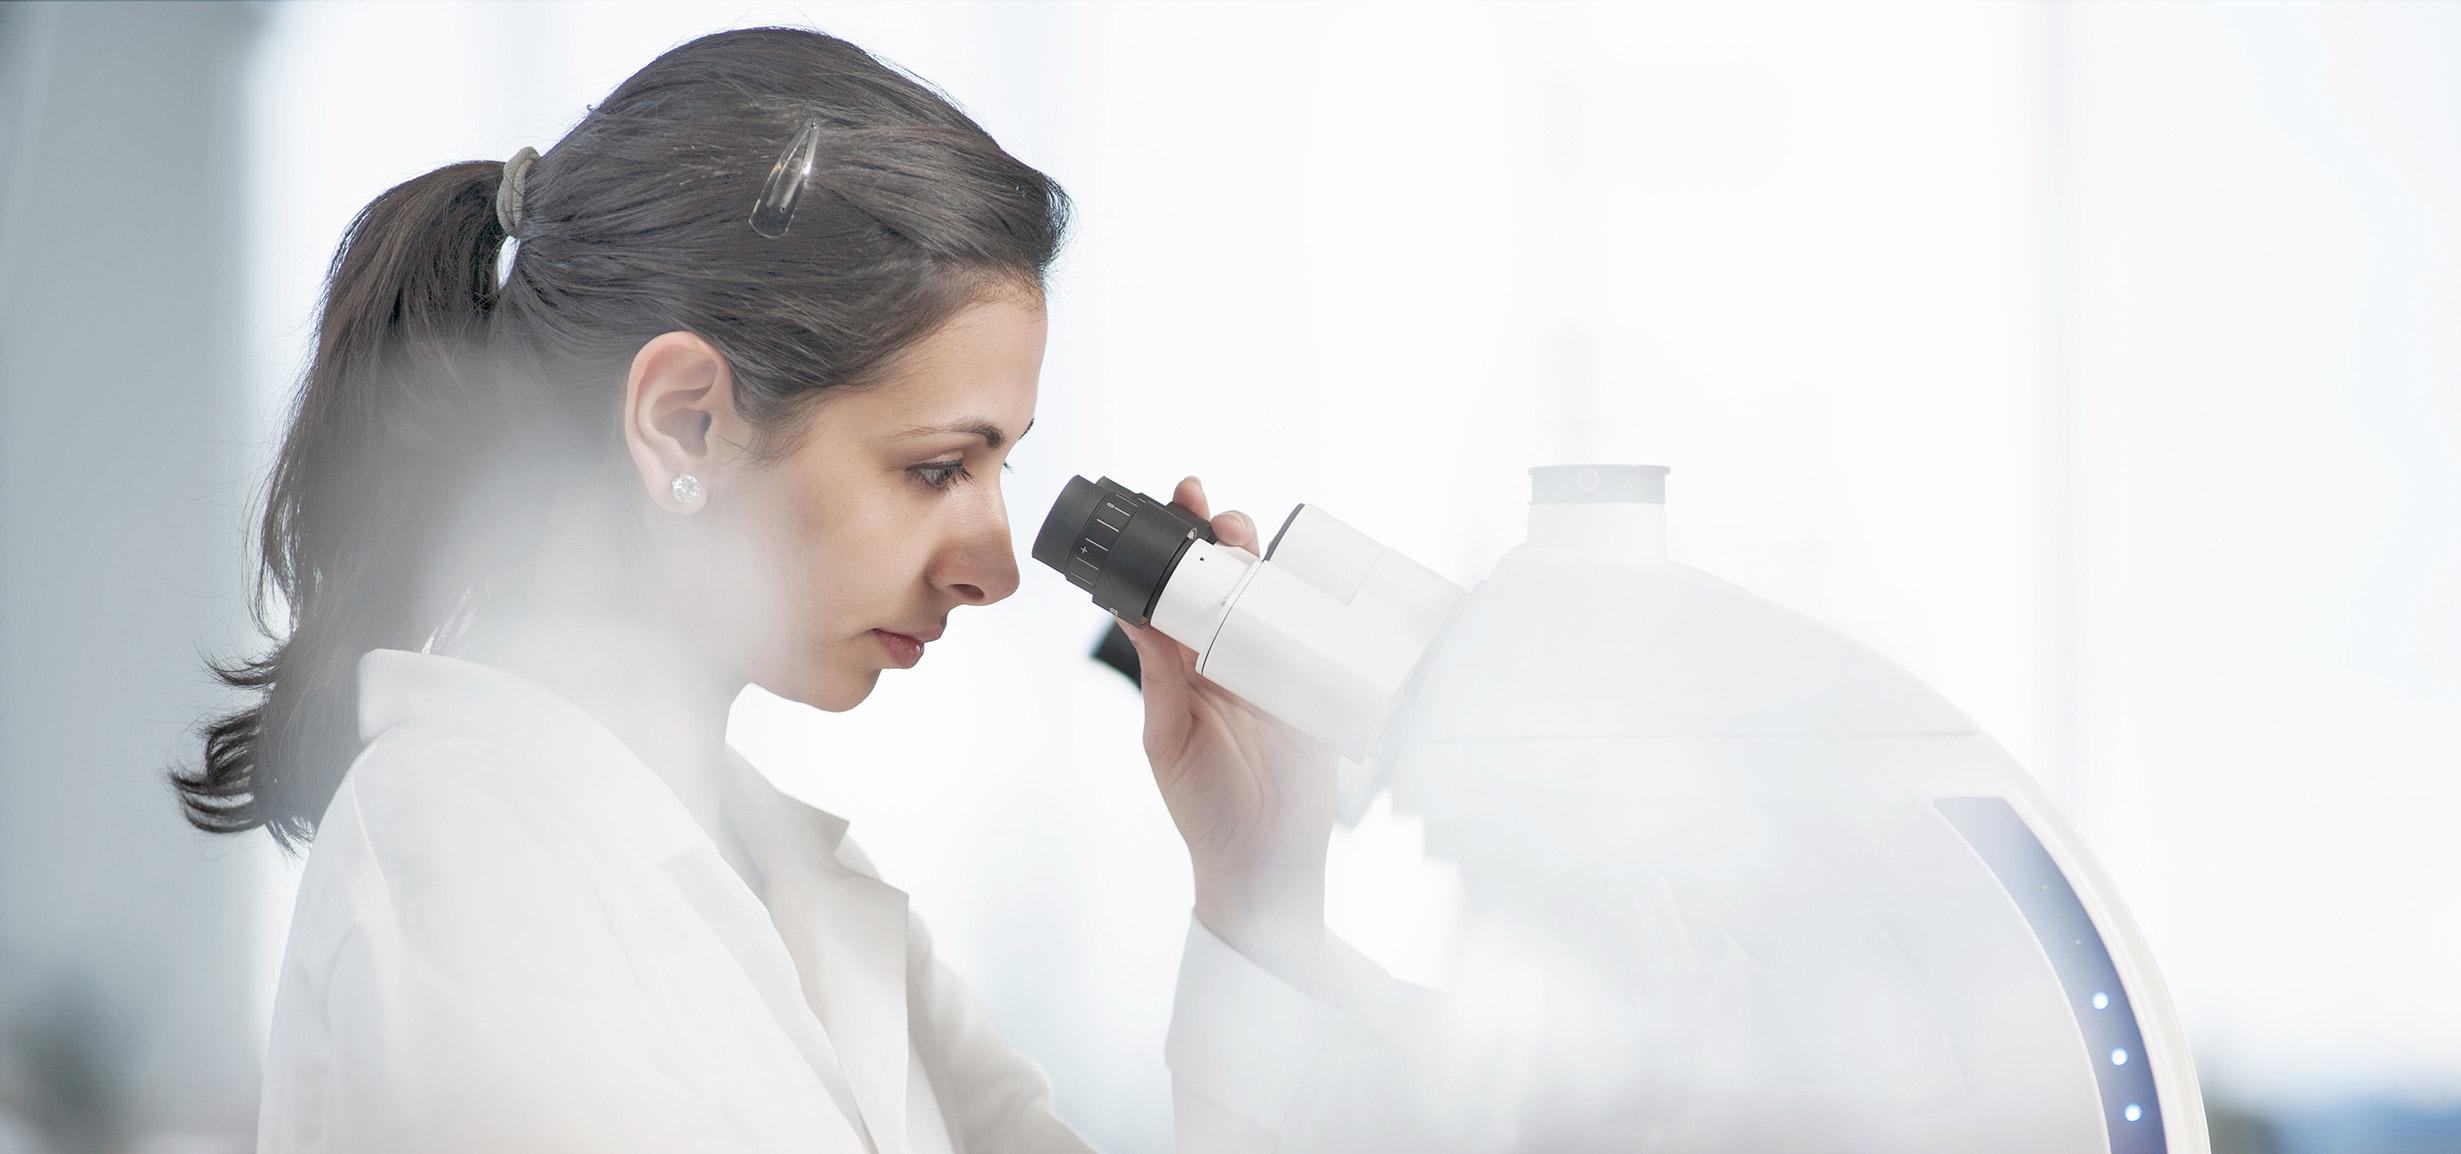 Medizin; Gesundheitswesen; Labor